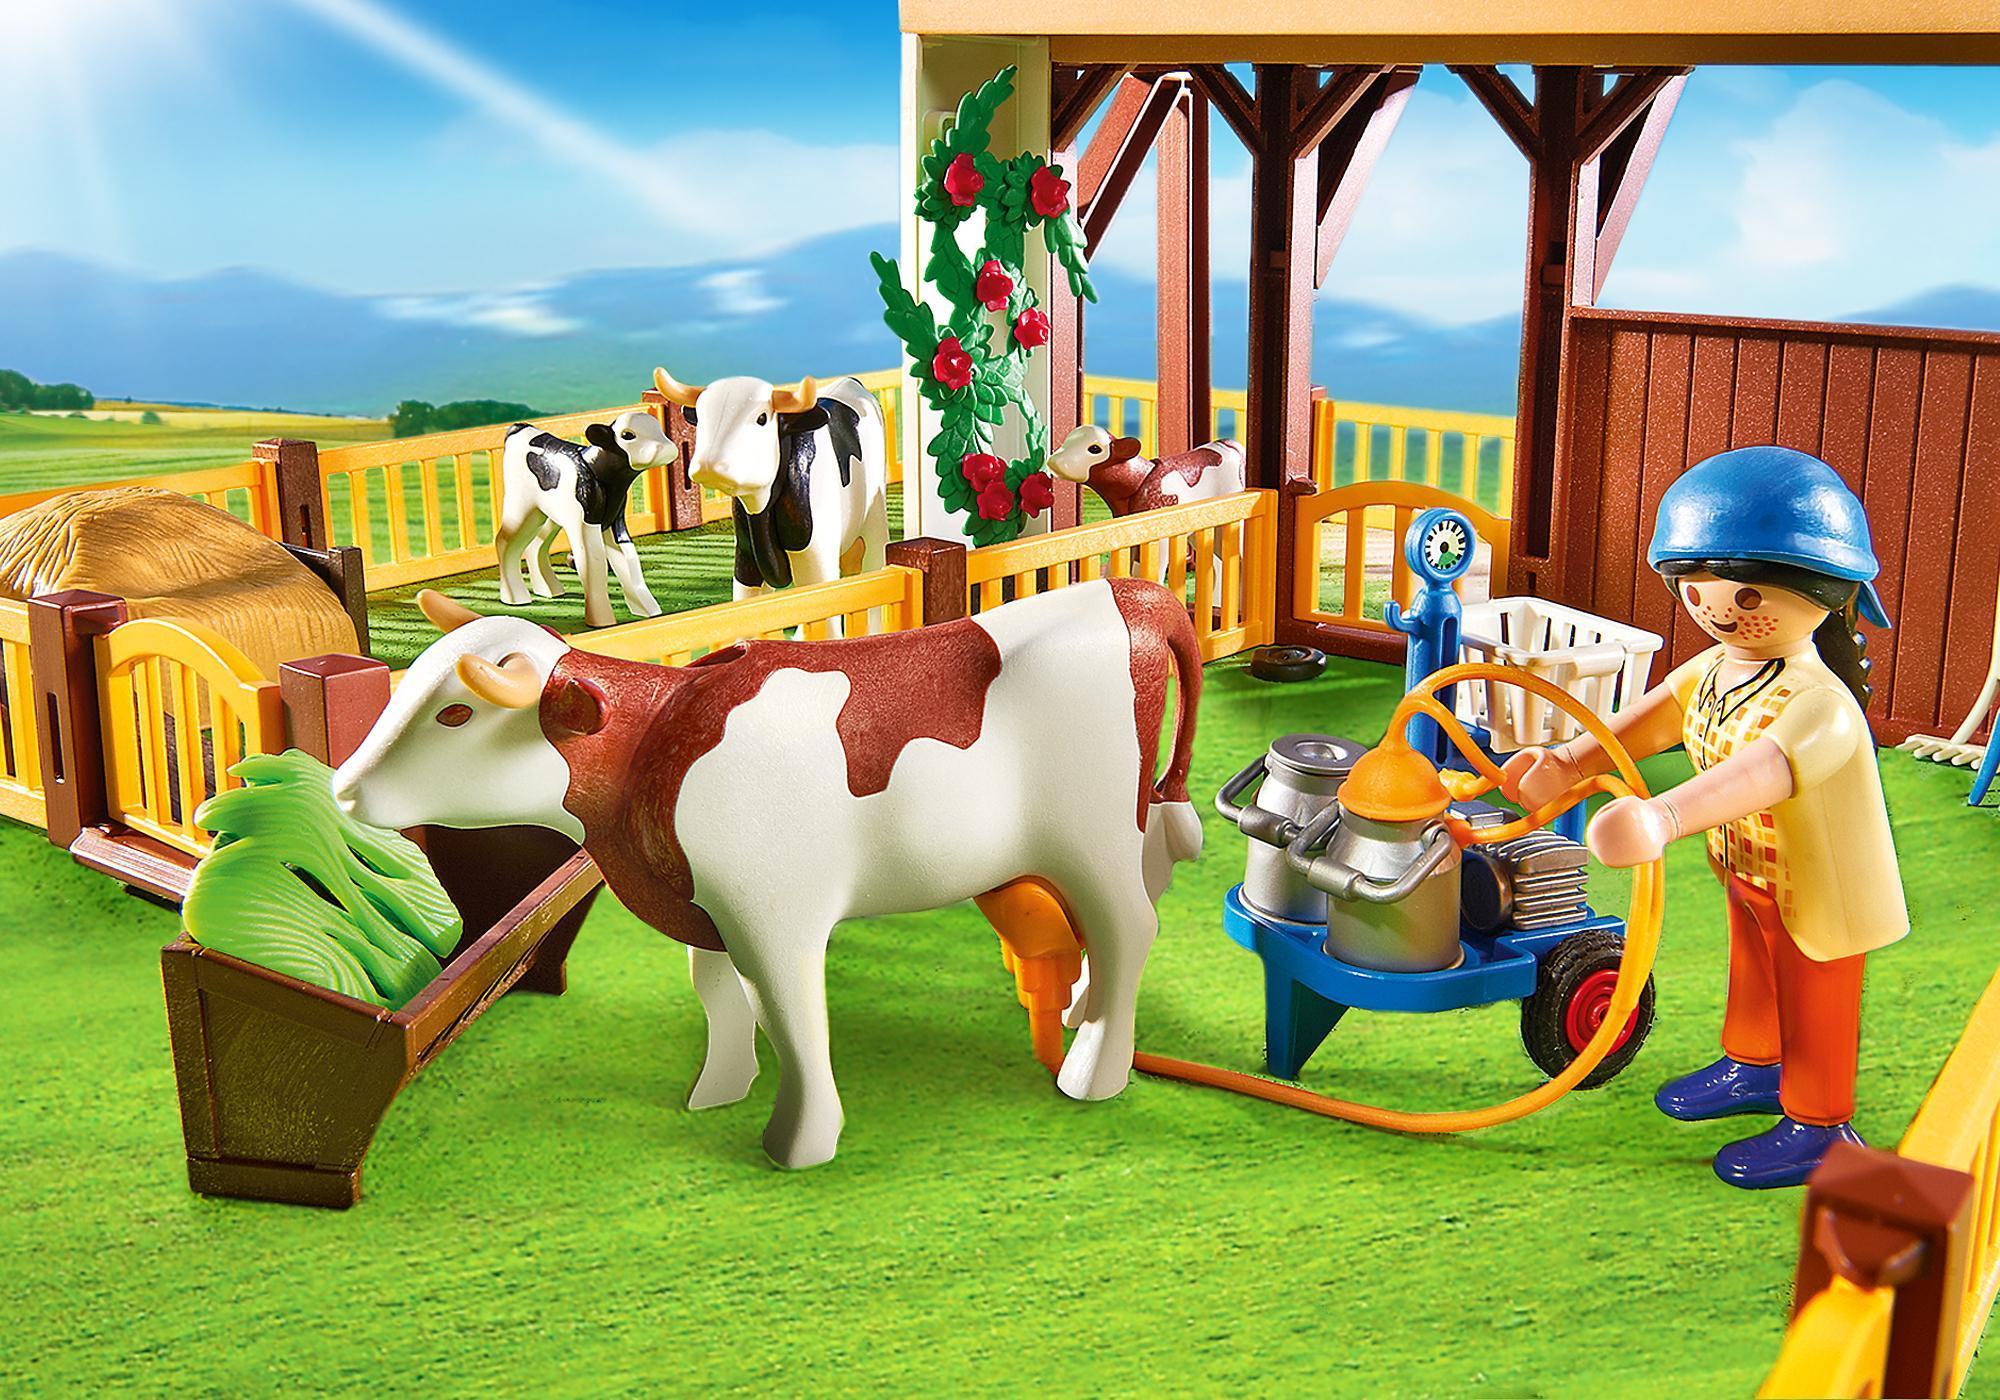 http://media.playmobil.com/i/playmobil/6120_product_extra1